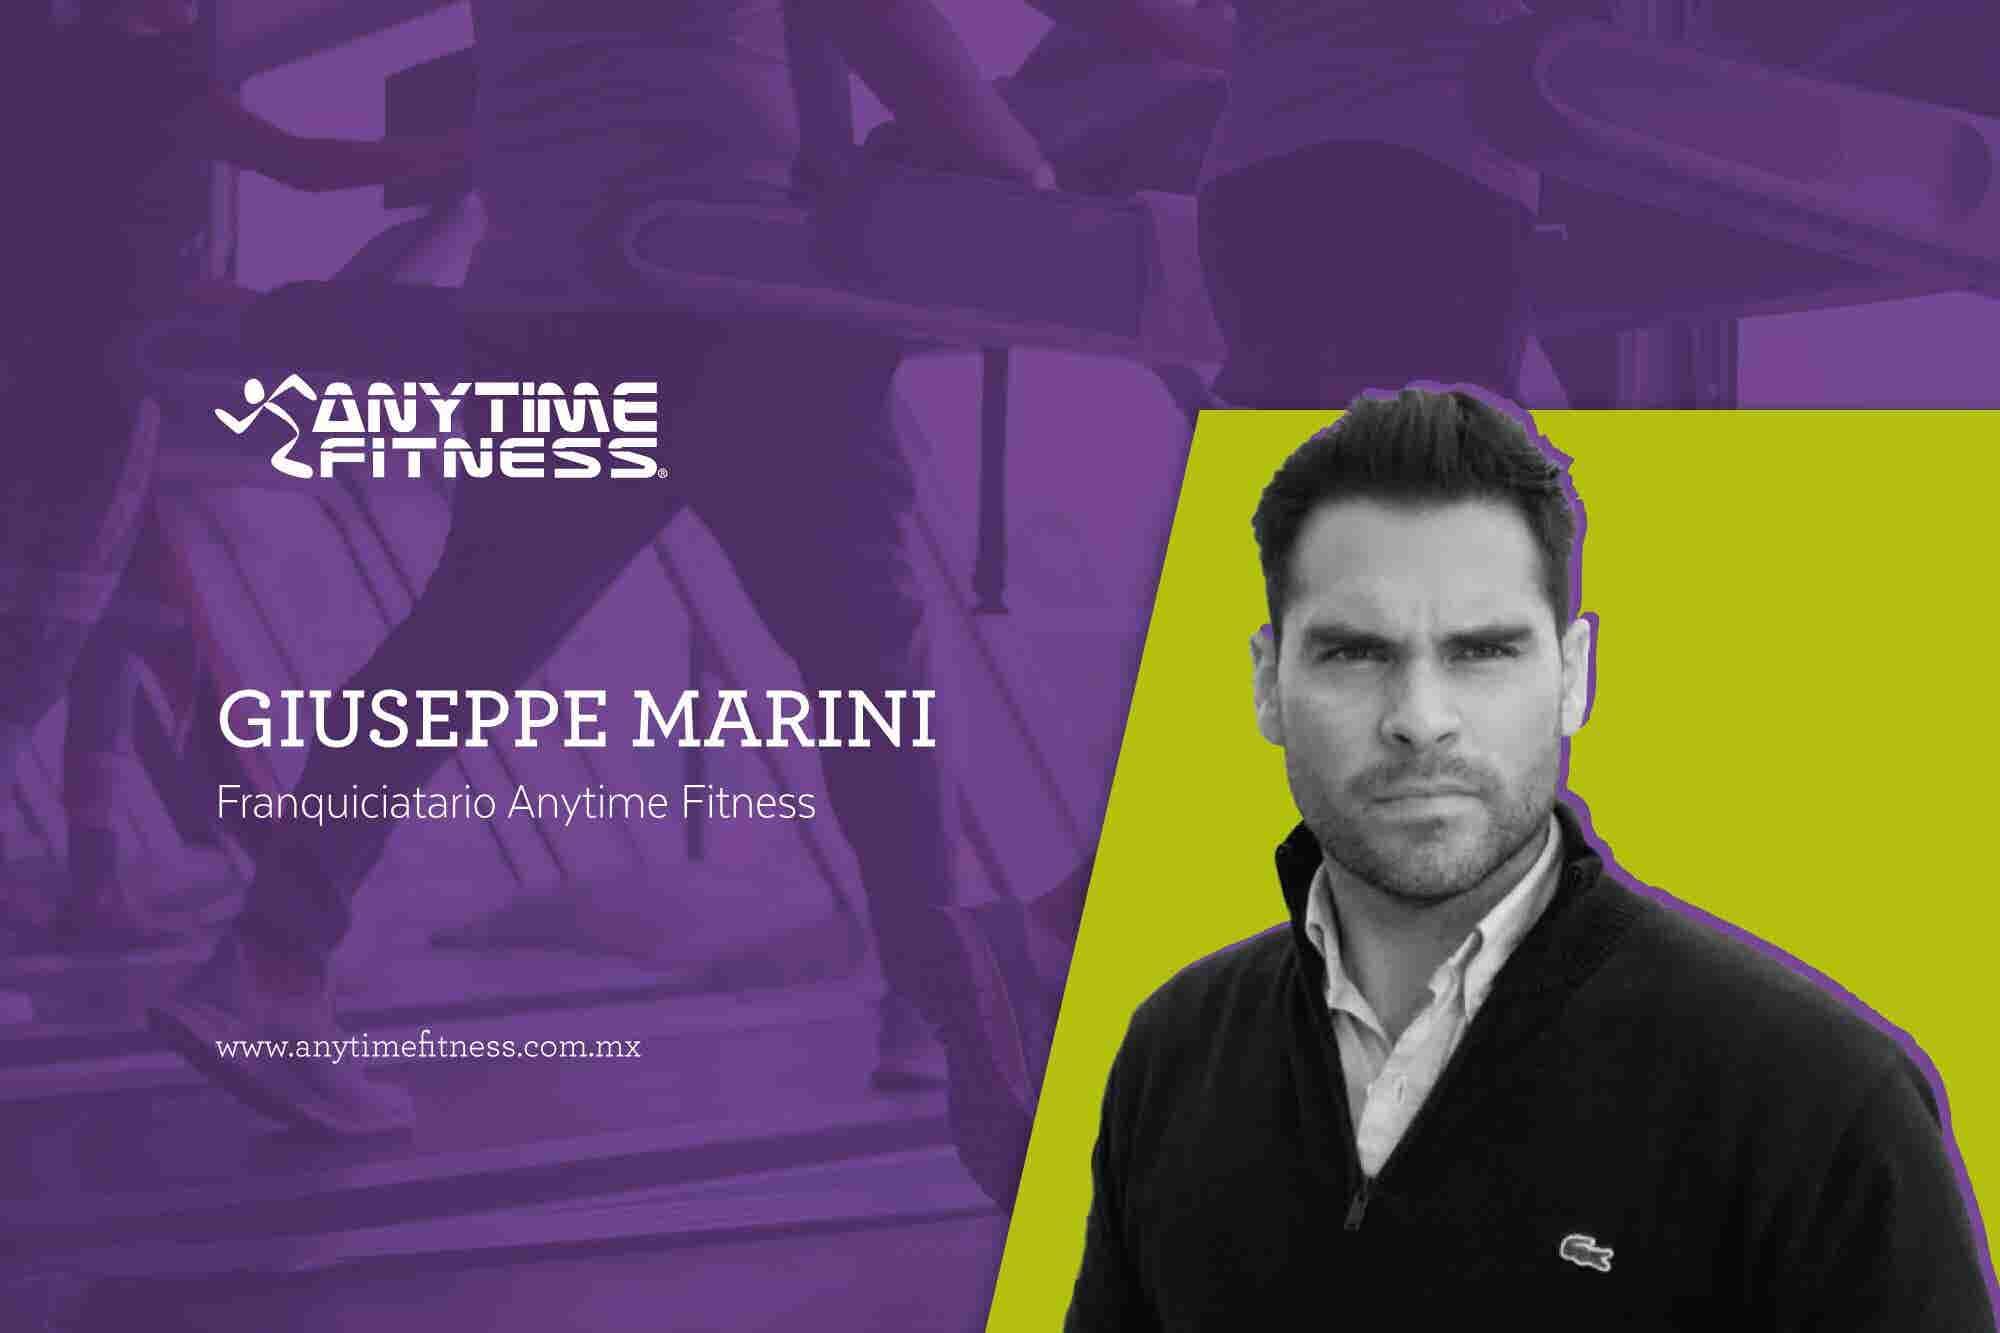 Anytime Fitness, la franquicia que est谩 cambiando vidas